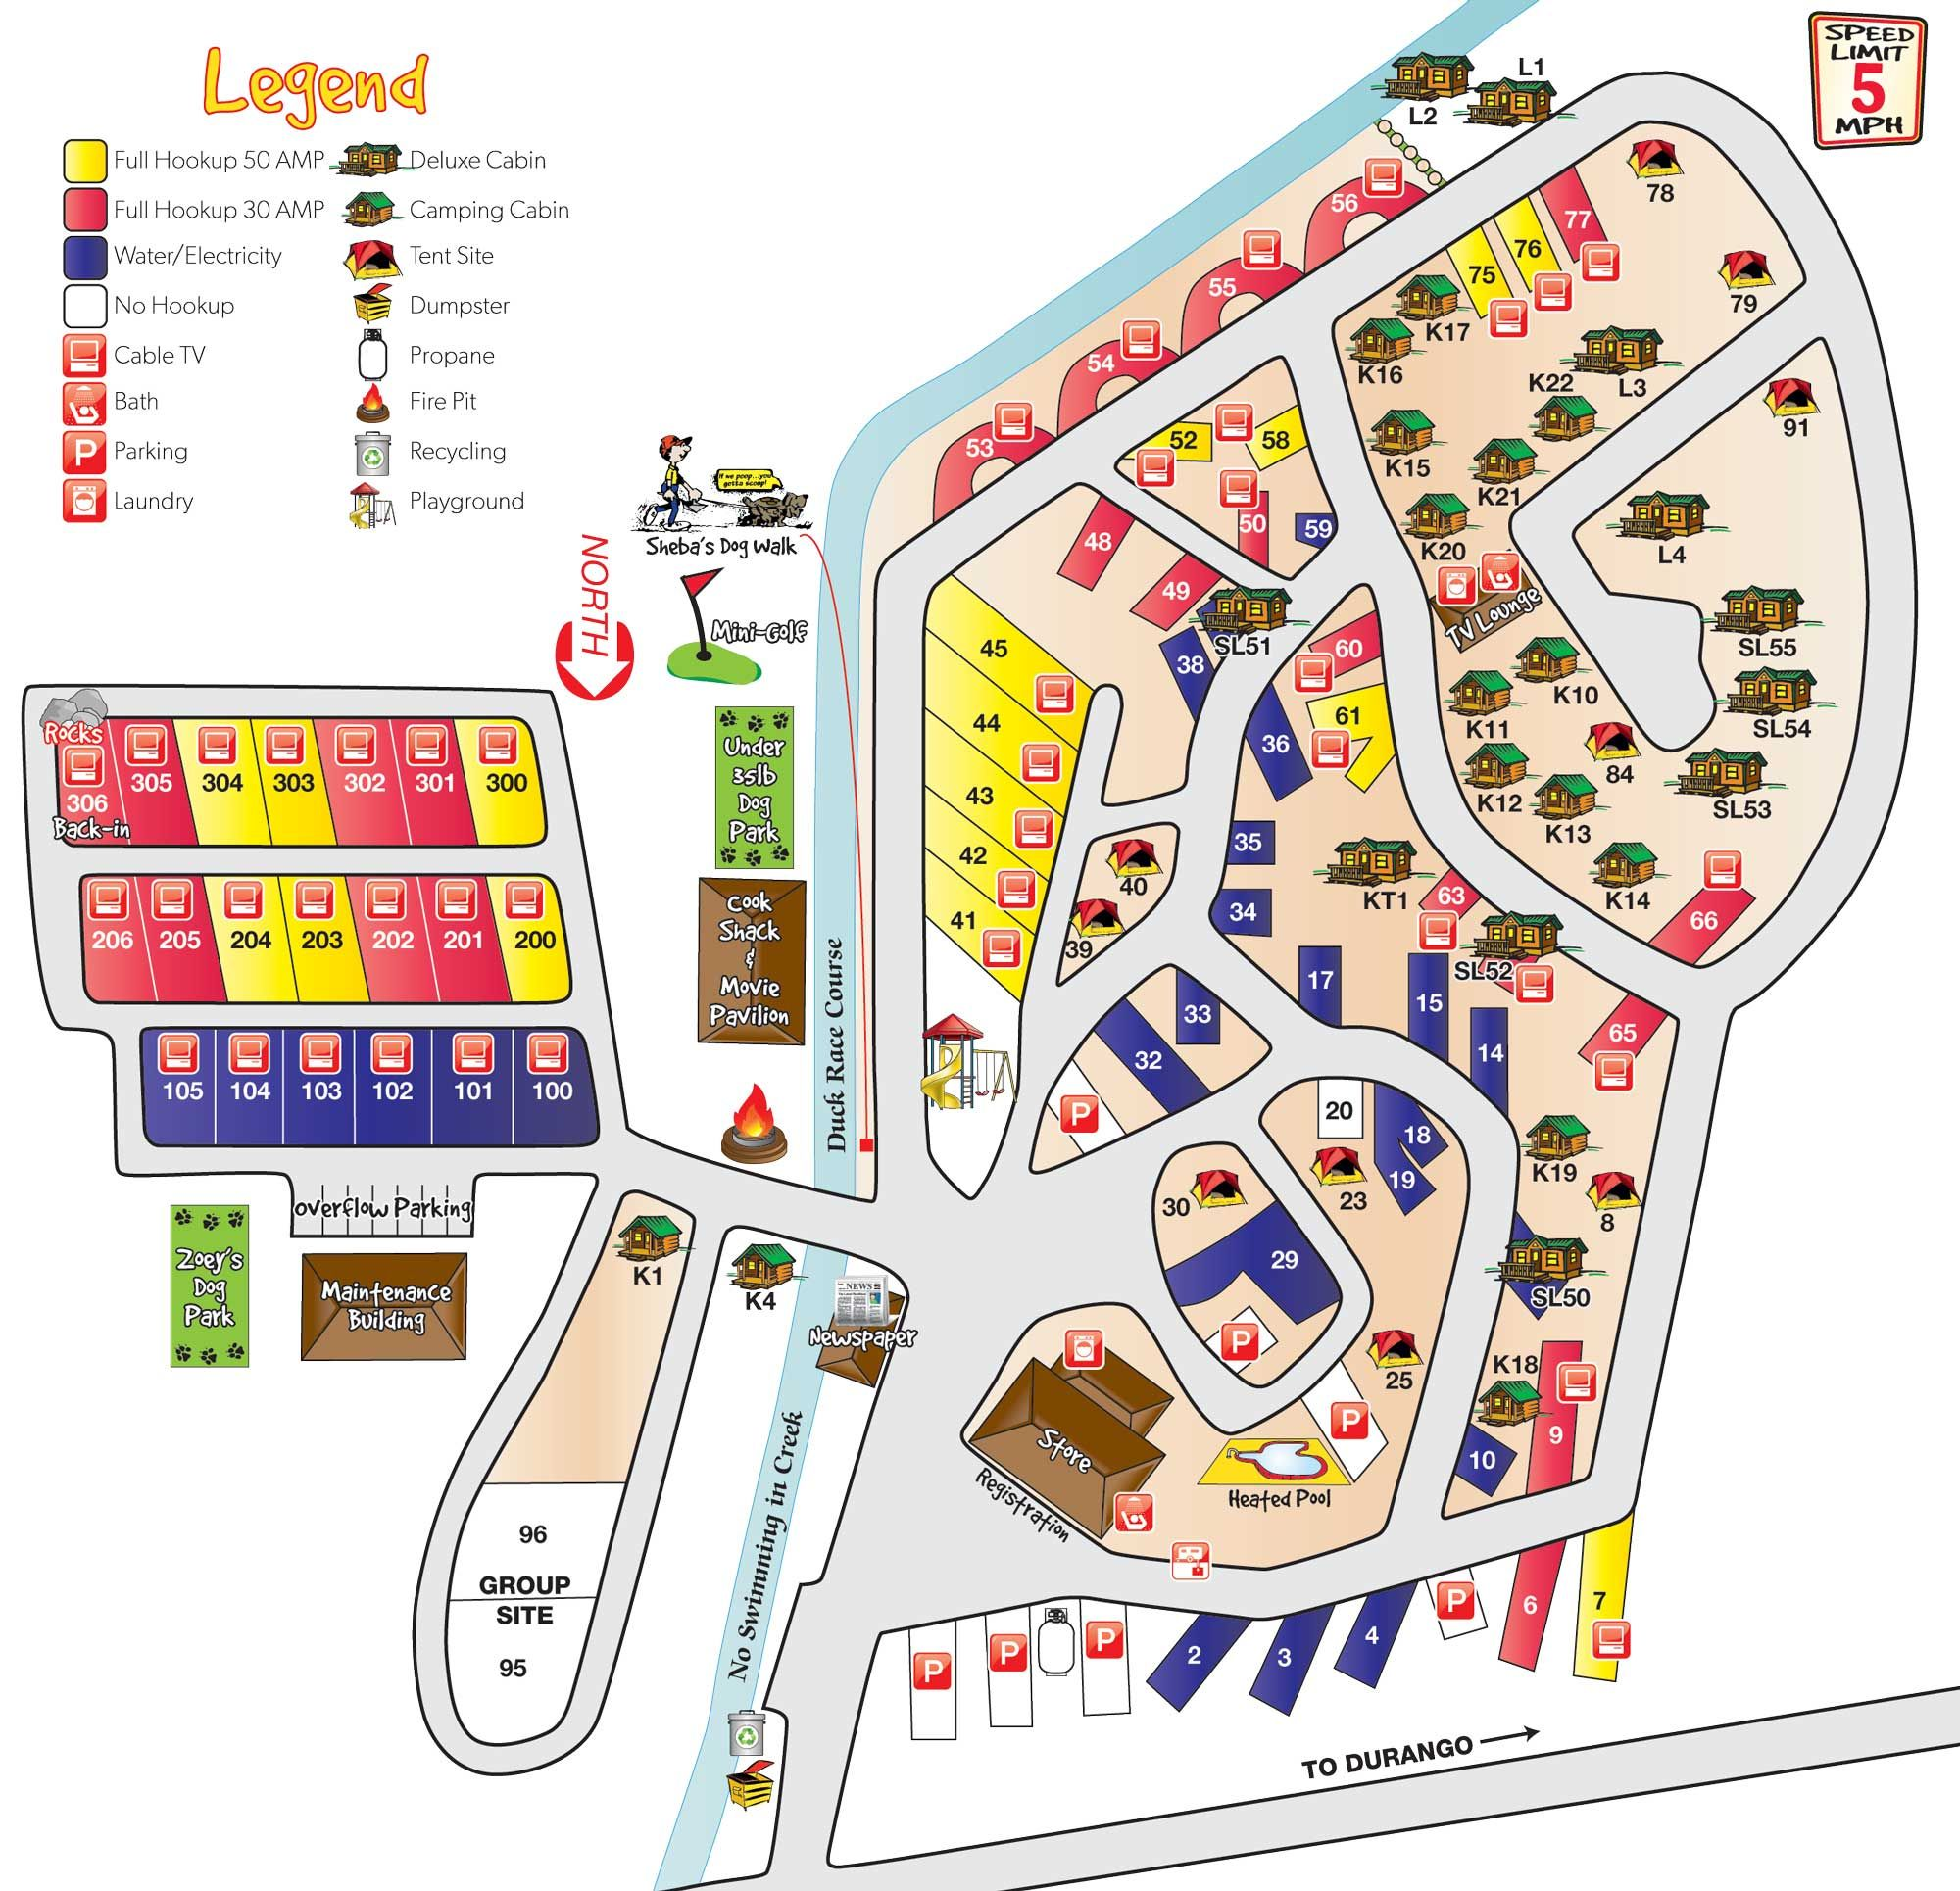 virginia koa campground map google search camp ground design